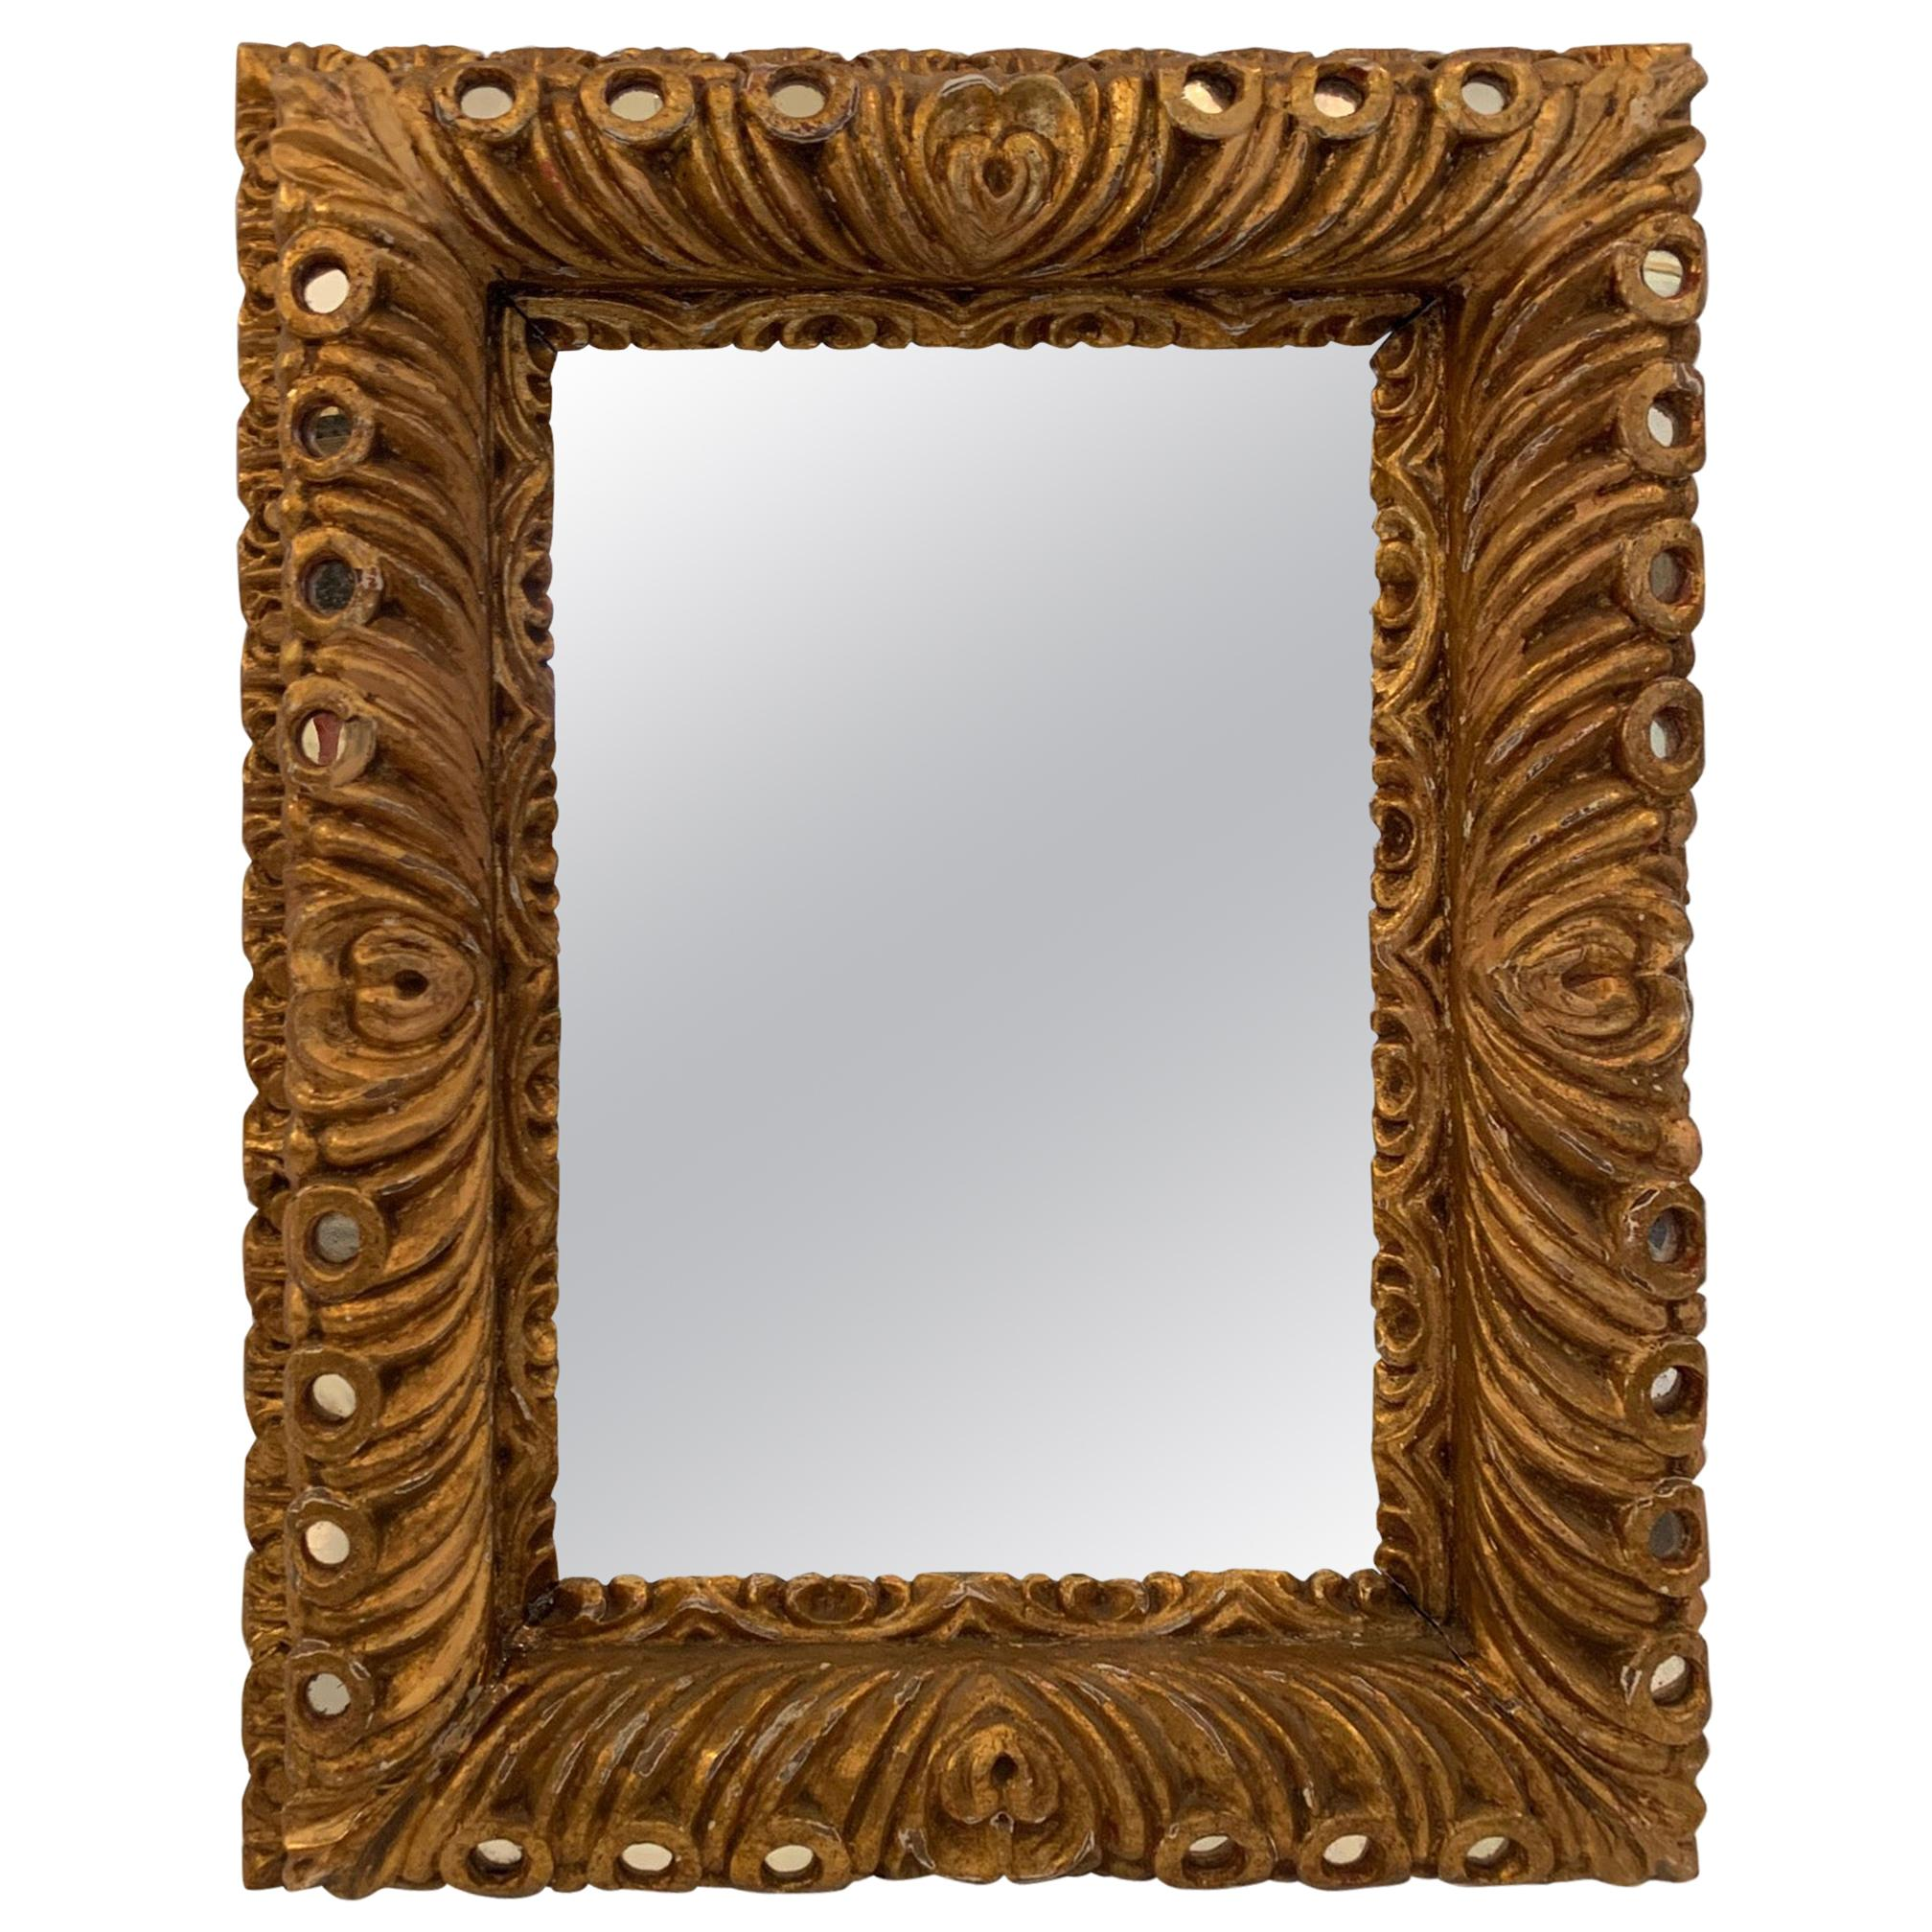 Sumptuous Italian Rococo Carved Wood Mirror